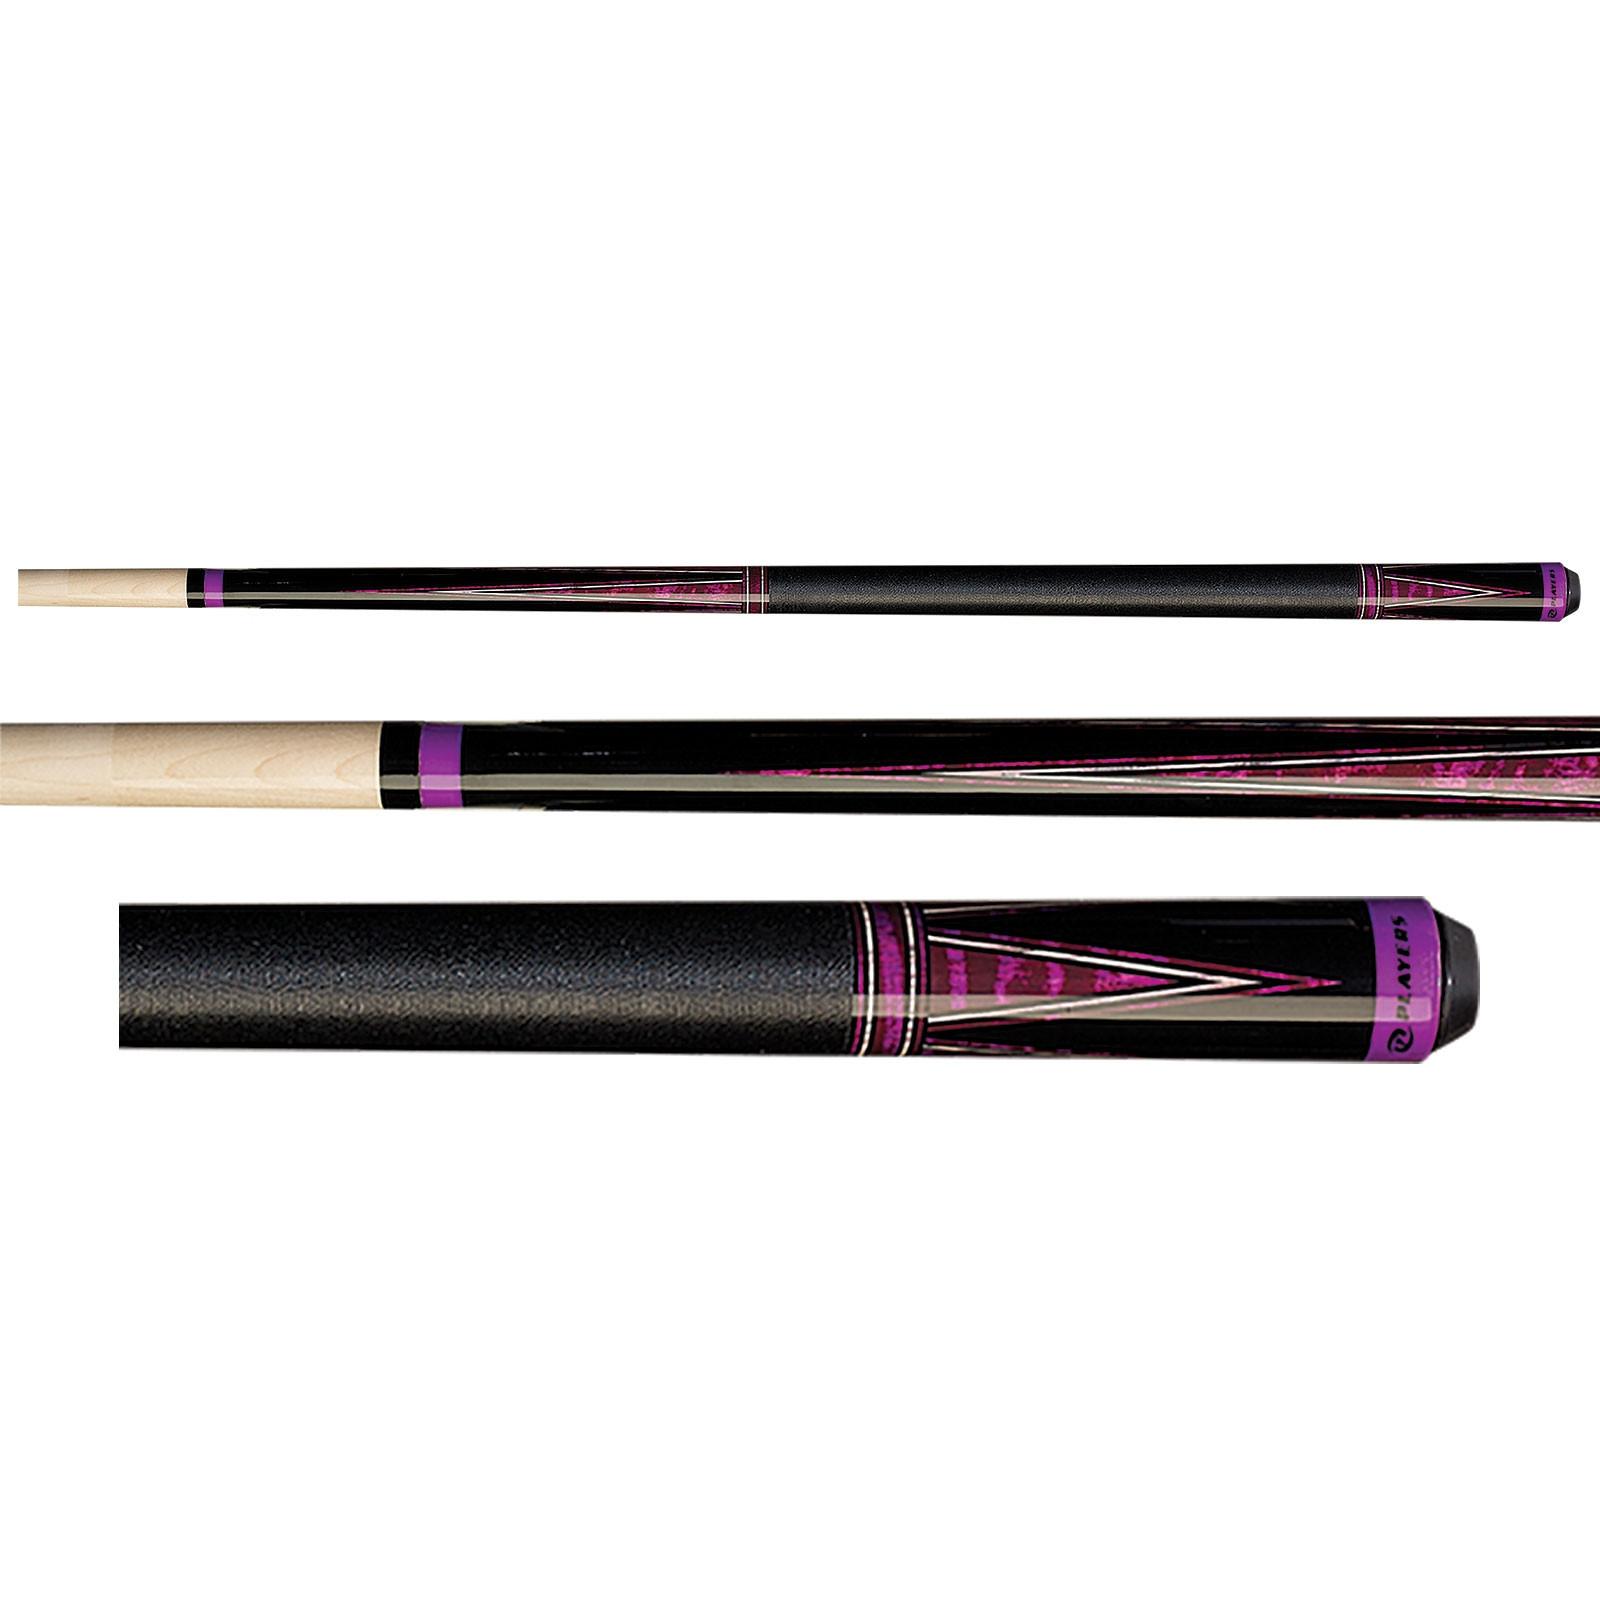 Players C-812 Black & Purple Pool Cue